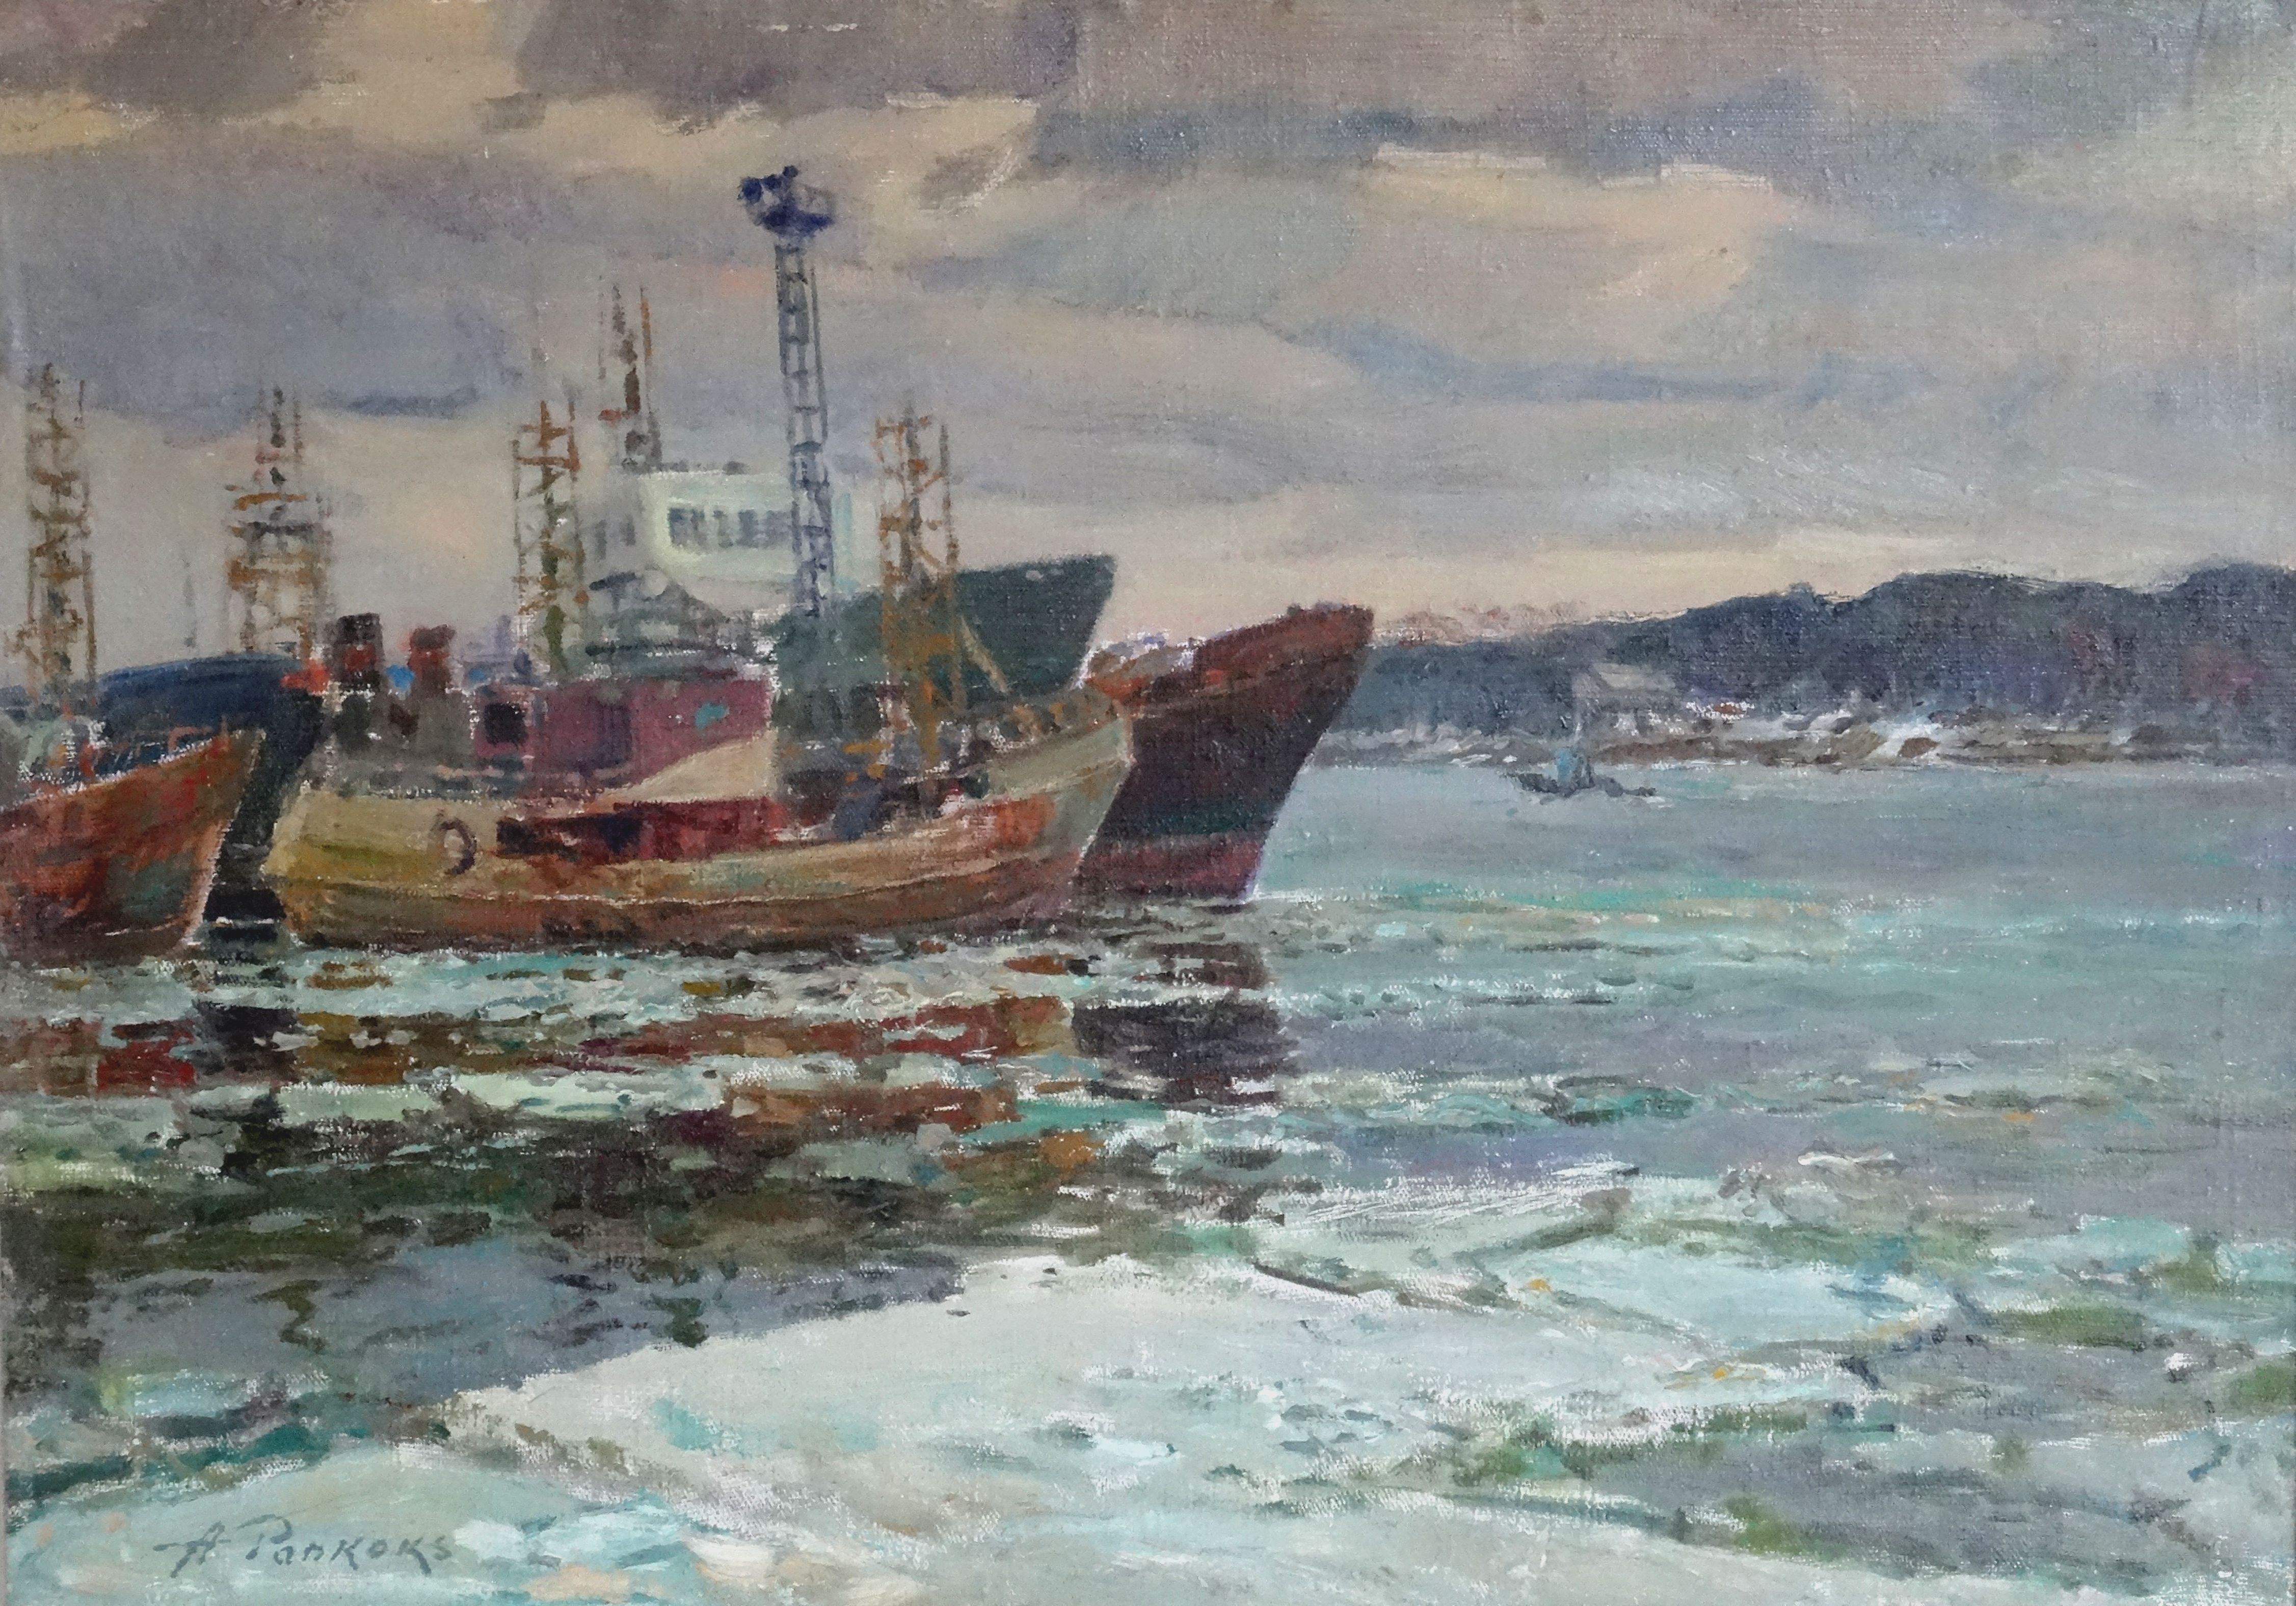 Ships in the port. Oil on cardboard, 51x70,5 cm